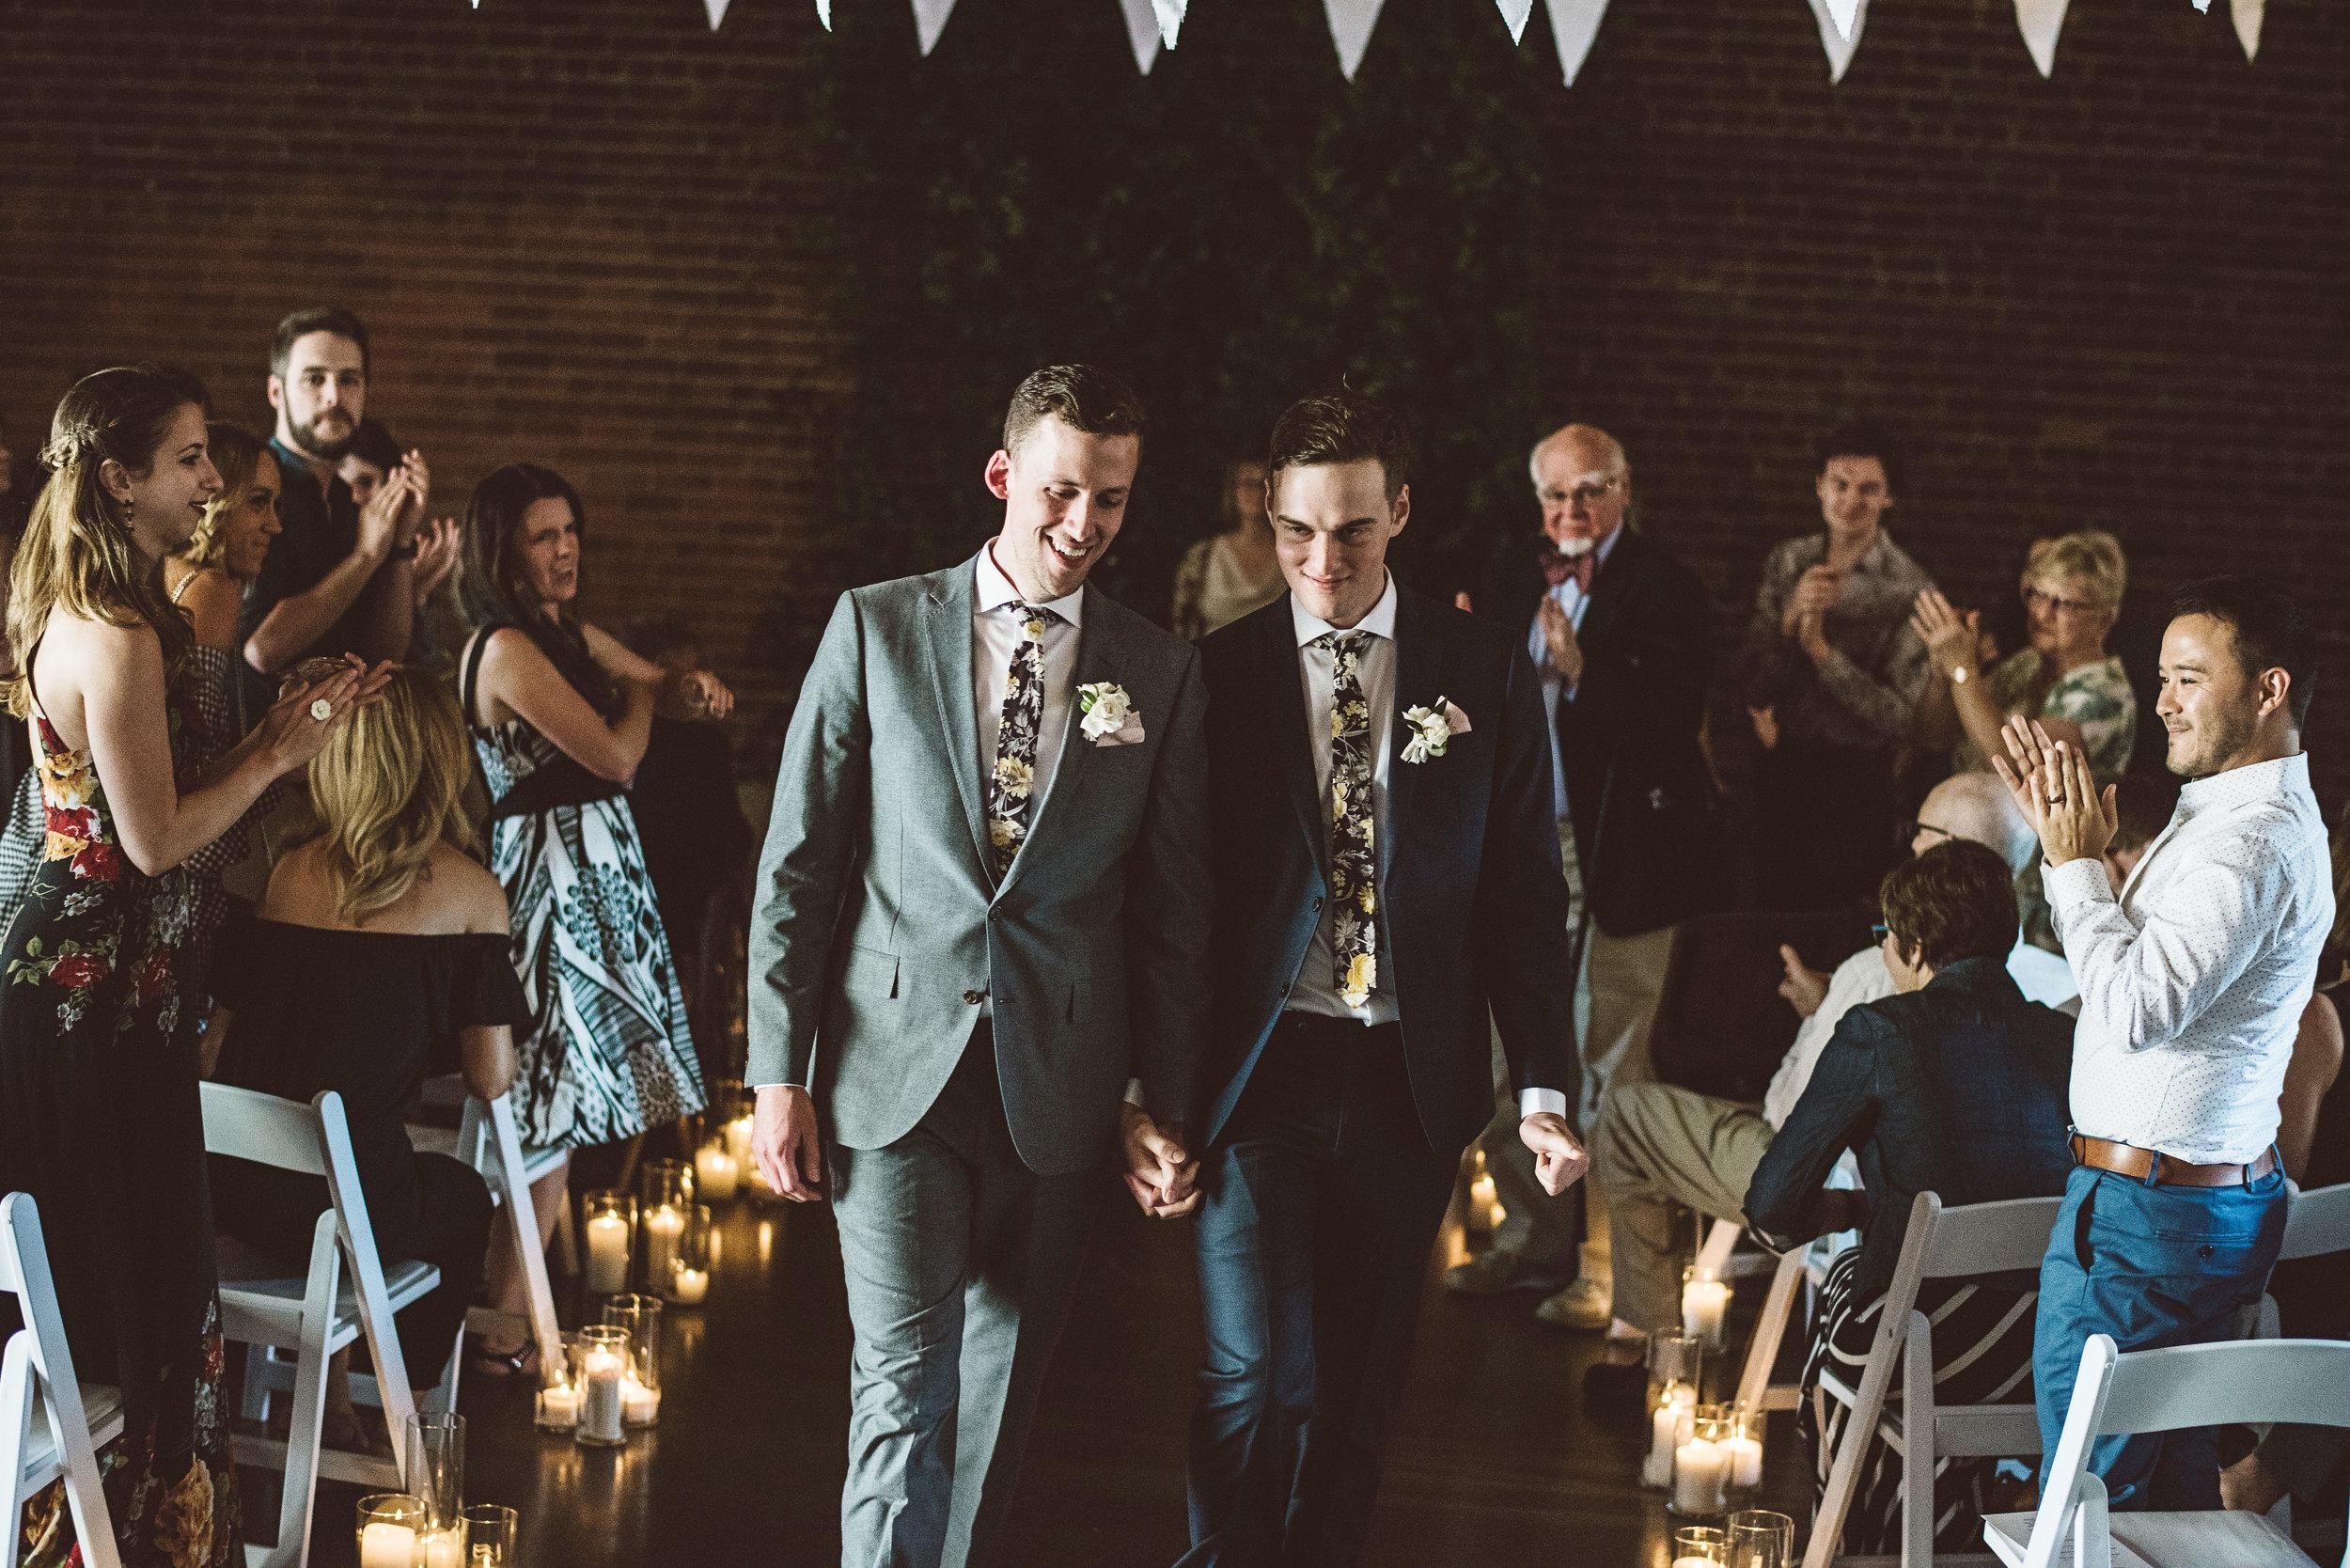 eric_derek_wedding_by_lucas_botz_photography_DSC_0630.jpg